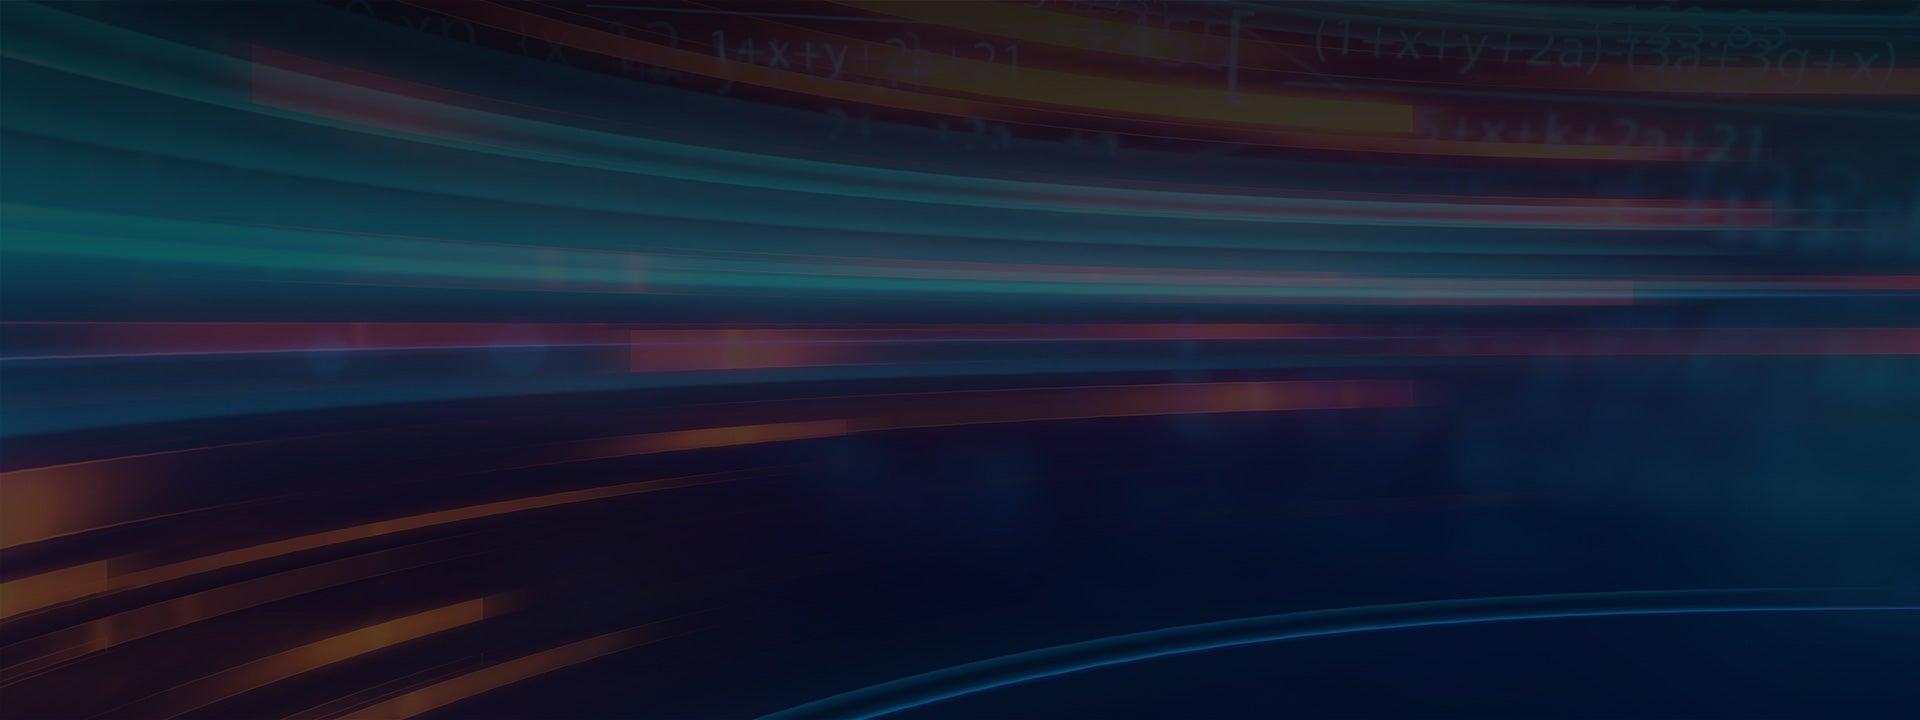 DataRobot A Leader In Worldwide Machine Learning Background V1.0